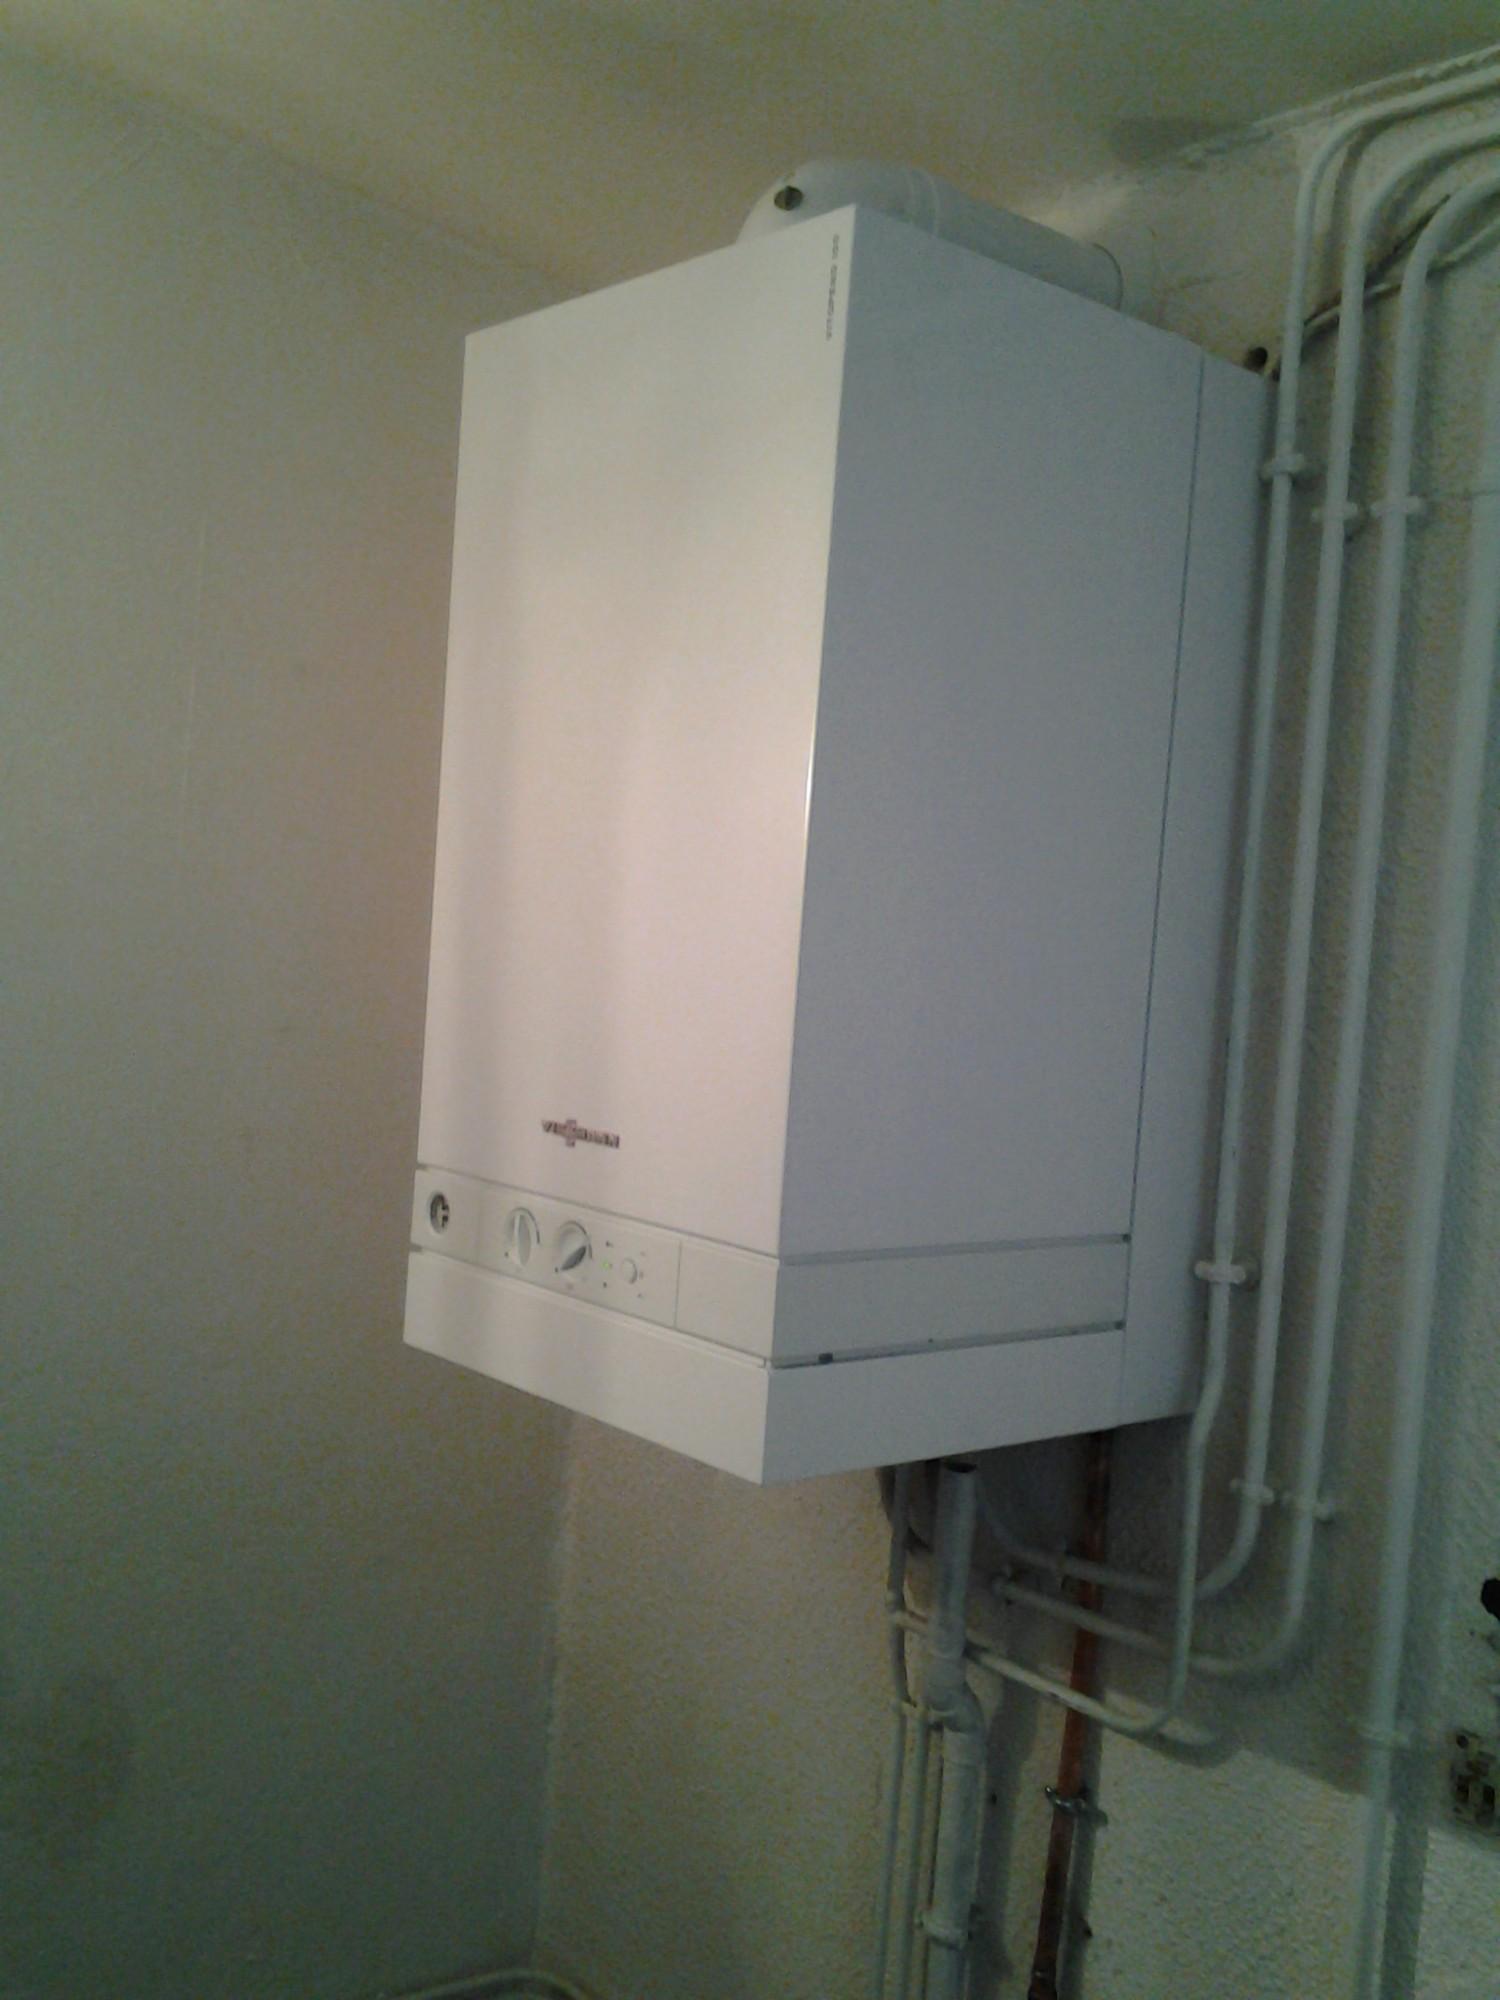 Réduire sa consommation d'énergie  - plombier chauffagiste 92